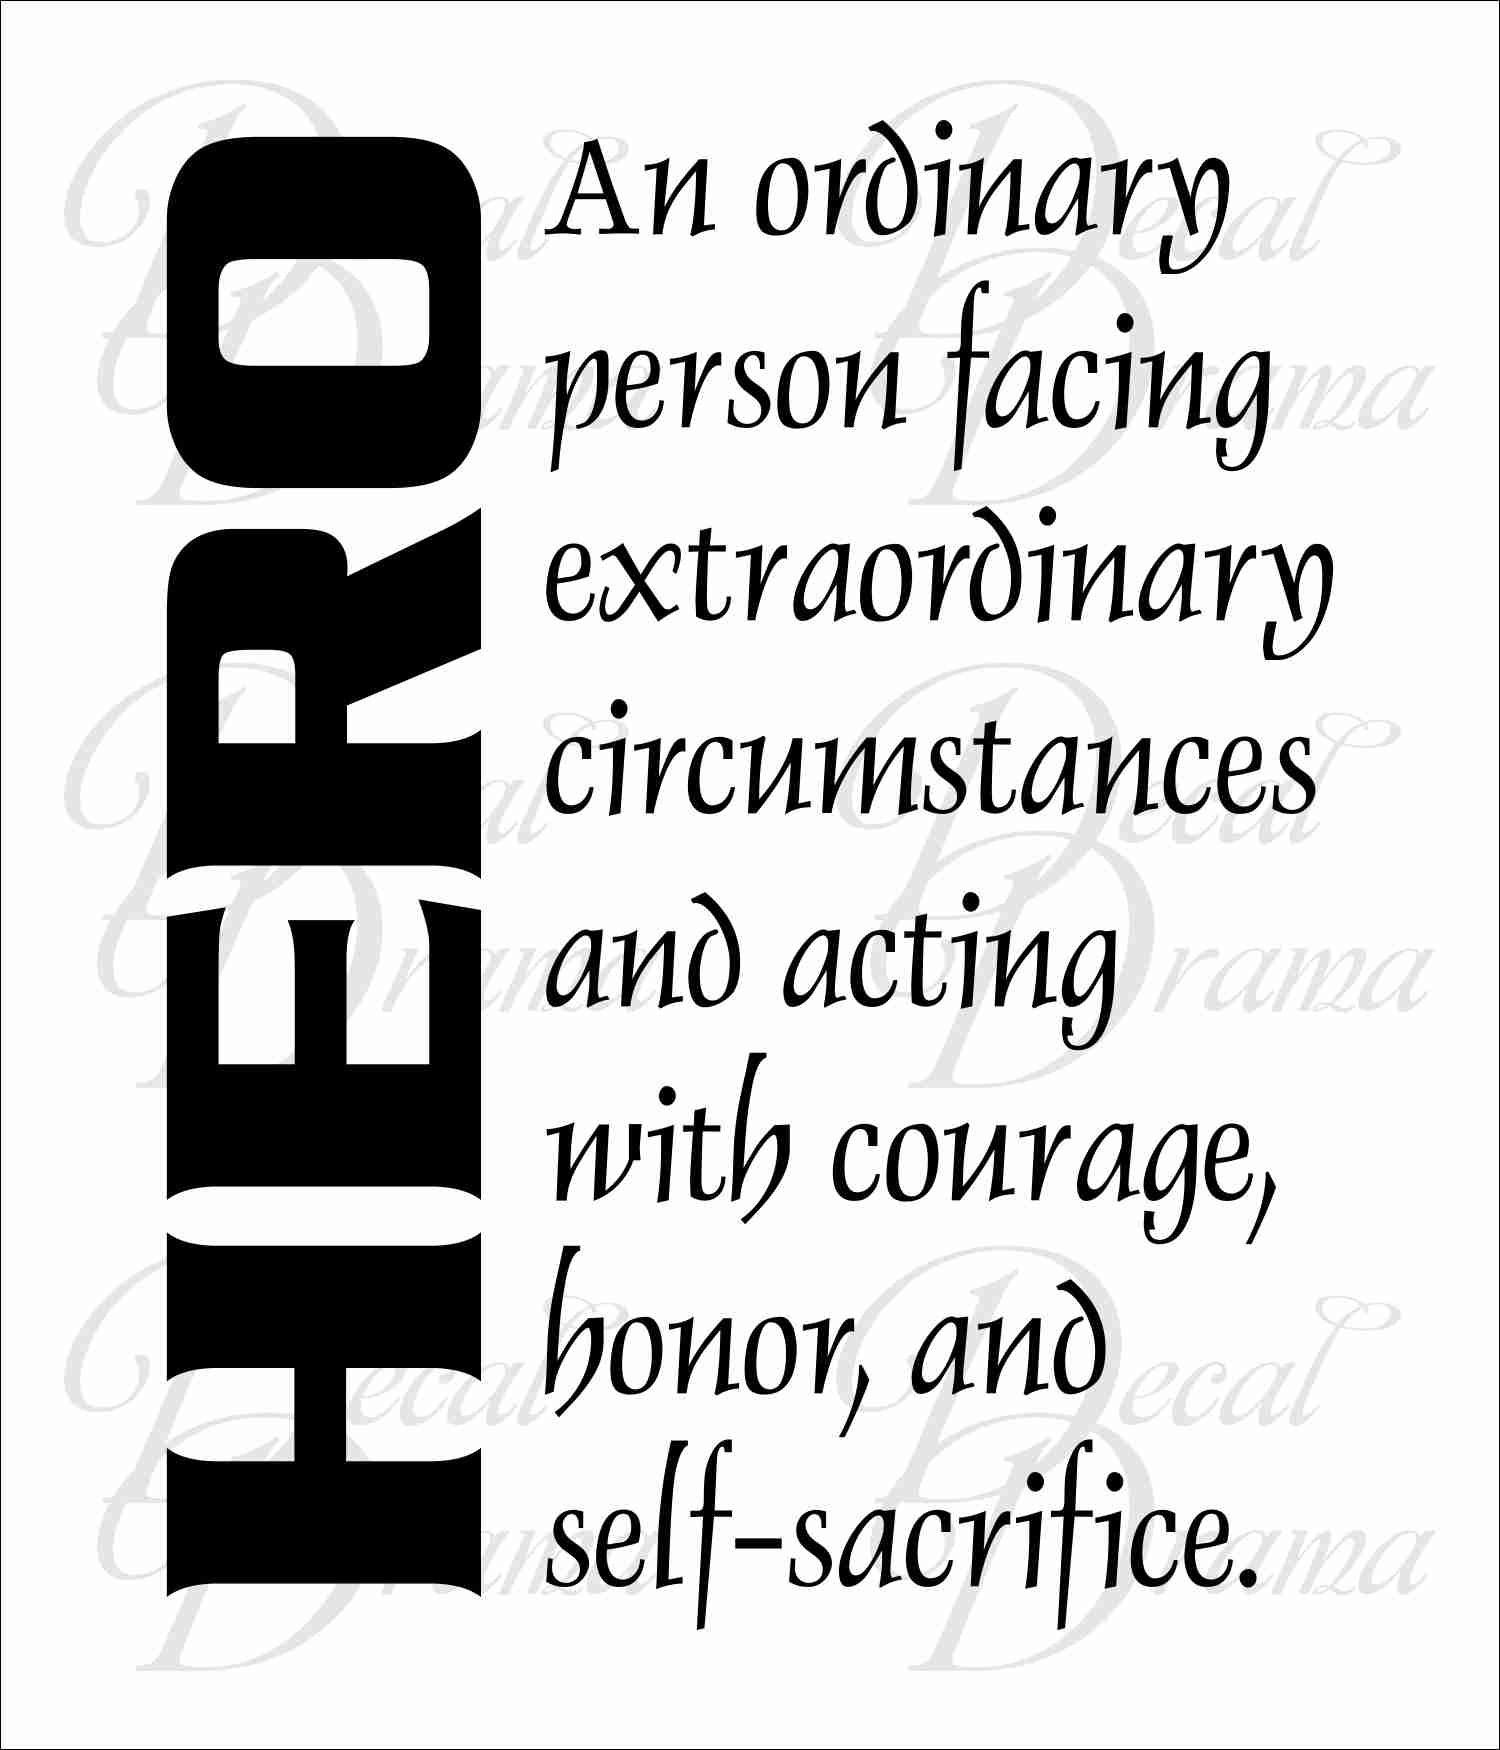 Hero Quotes Hero Definition An Ordinary Person Facing Extraordinary